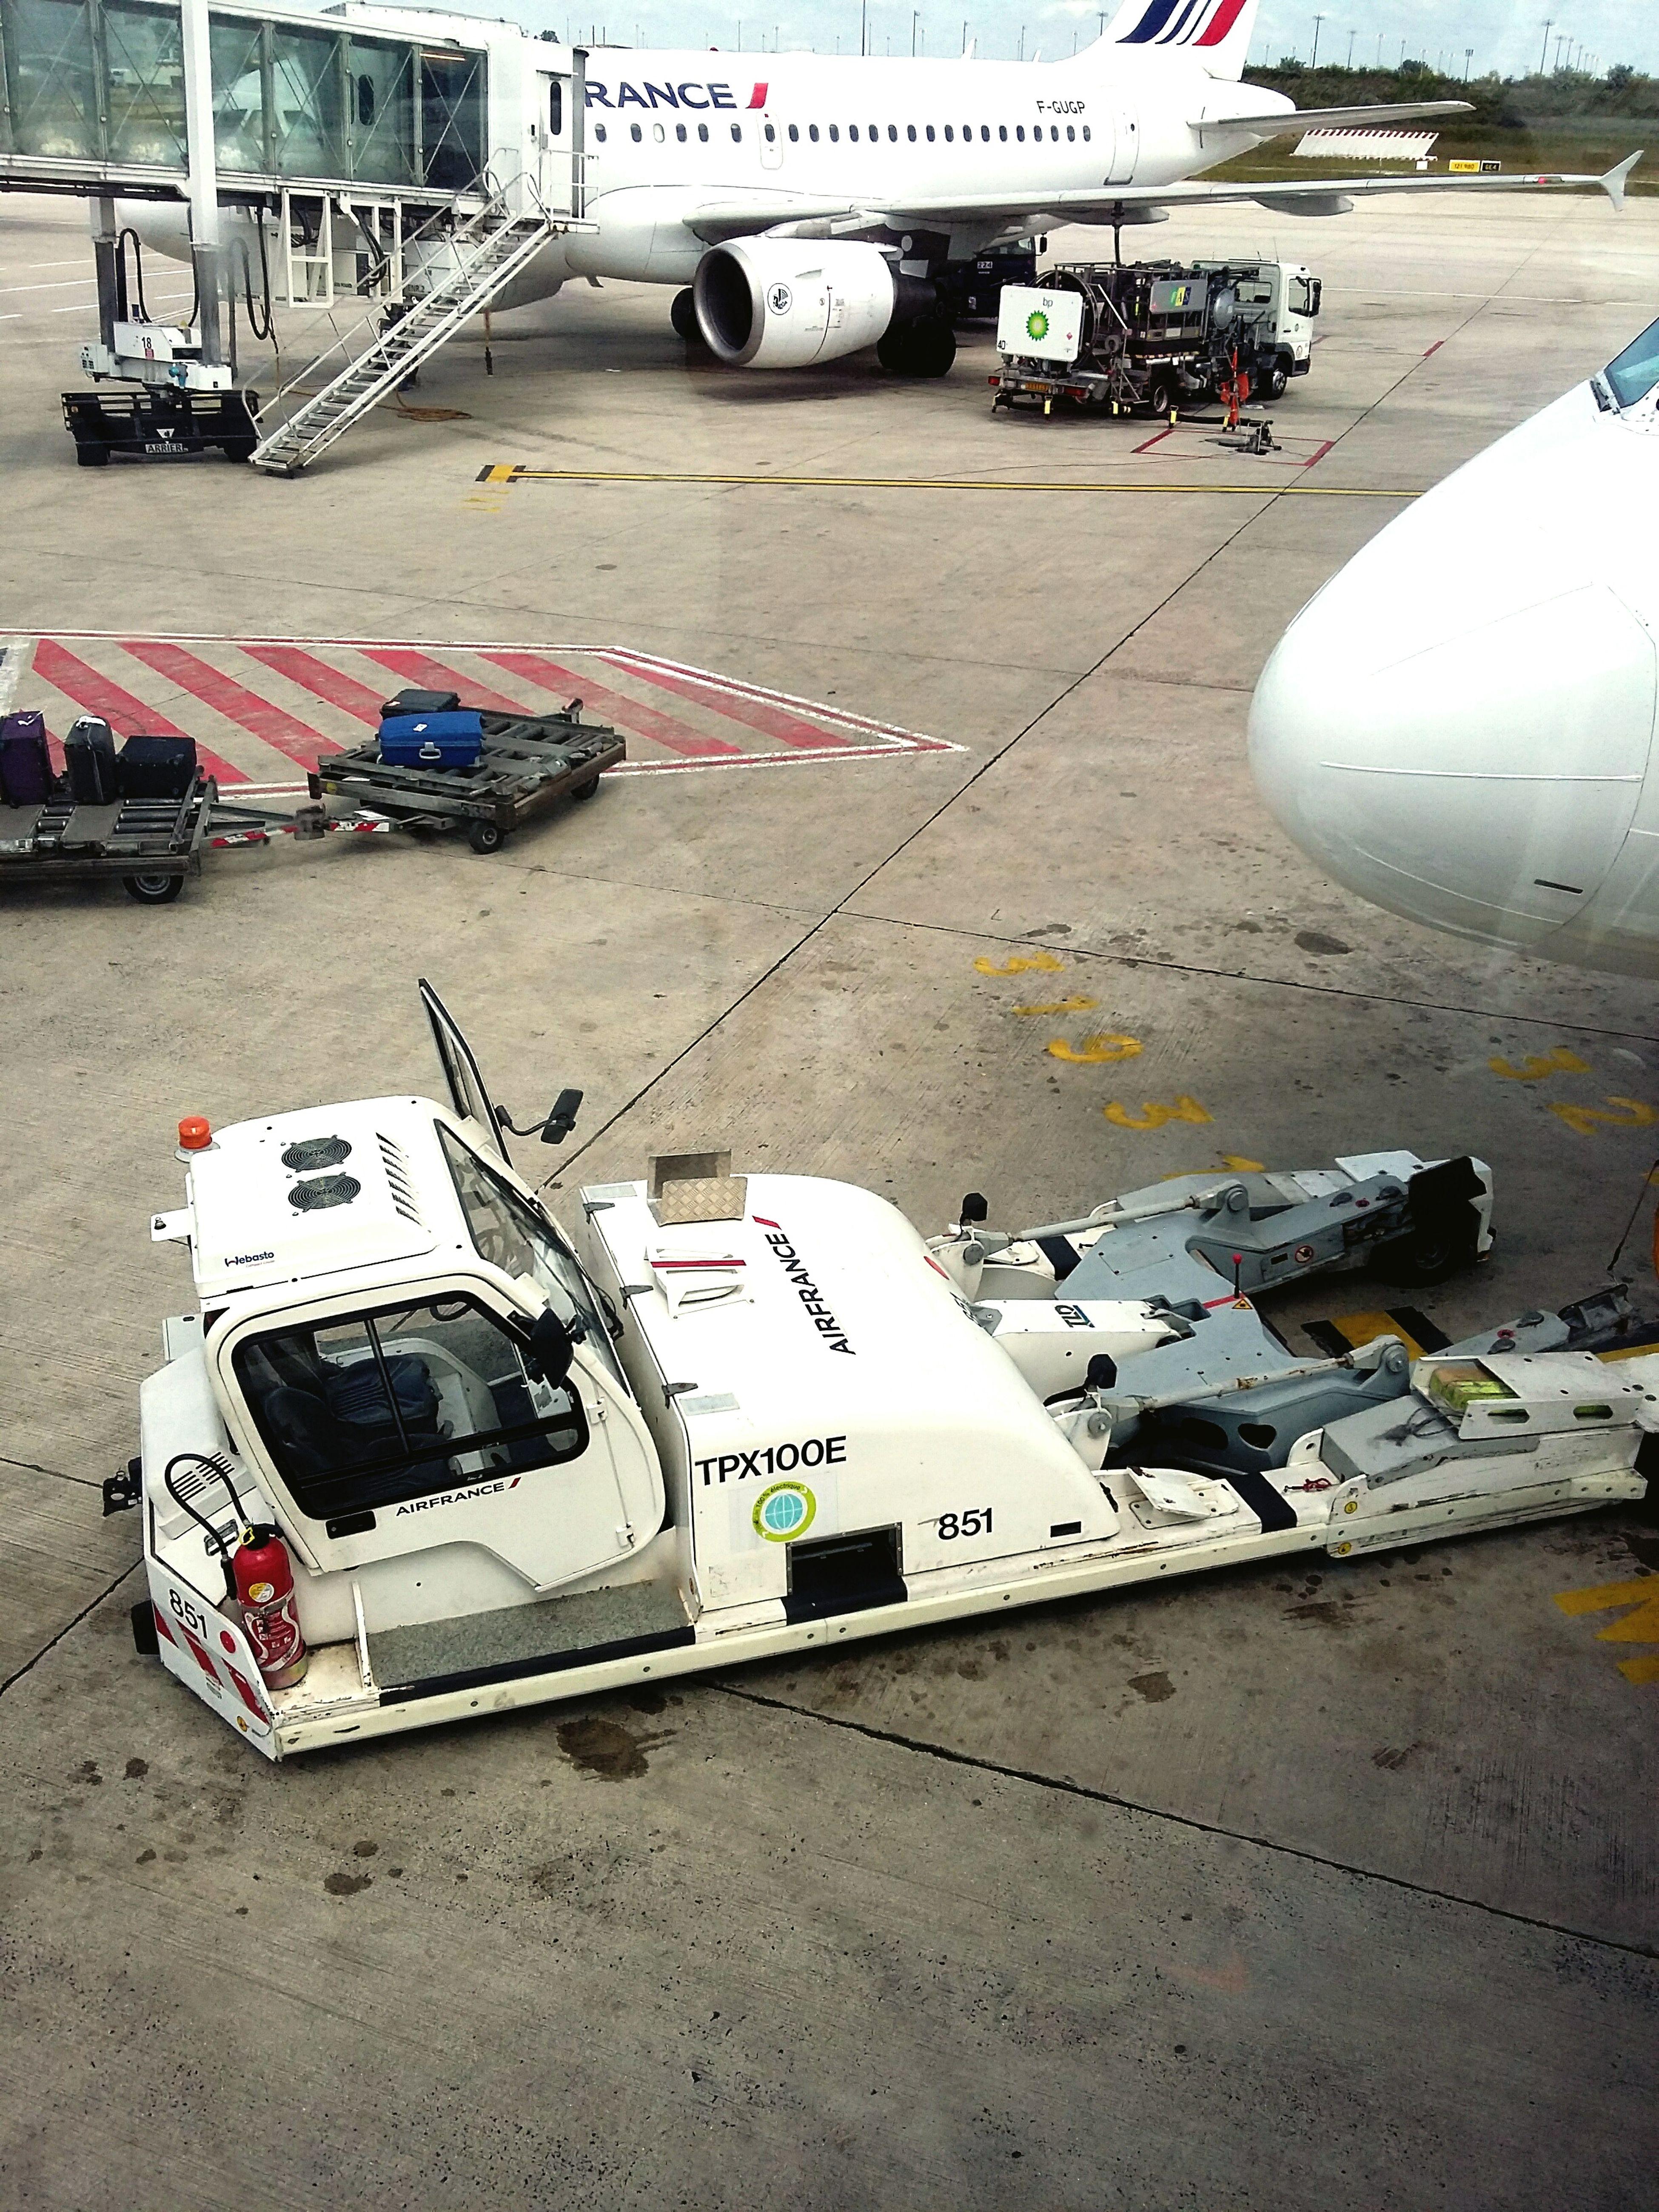 Airport Fighter ;) · France Cdg Transportation Logistics Industrial Design Star Wars On Earth